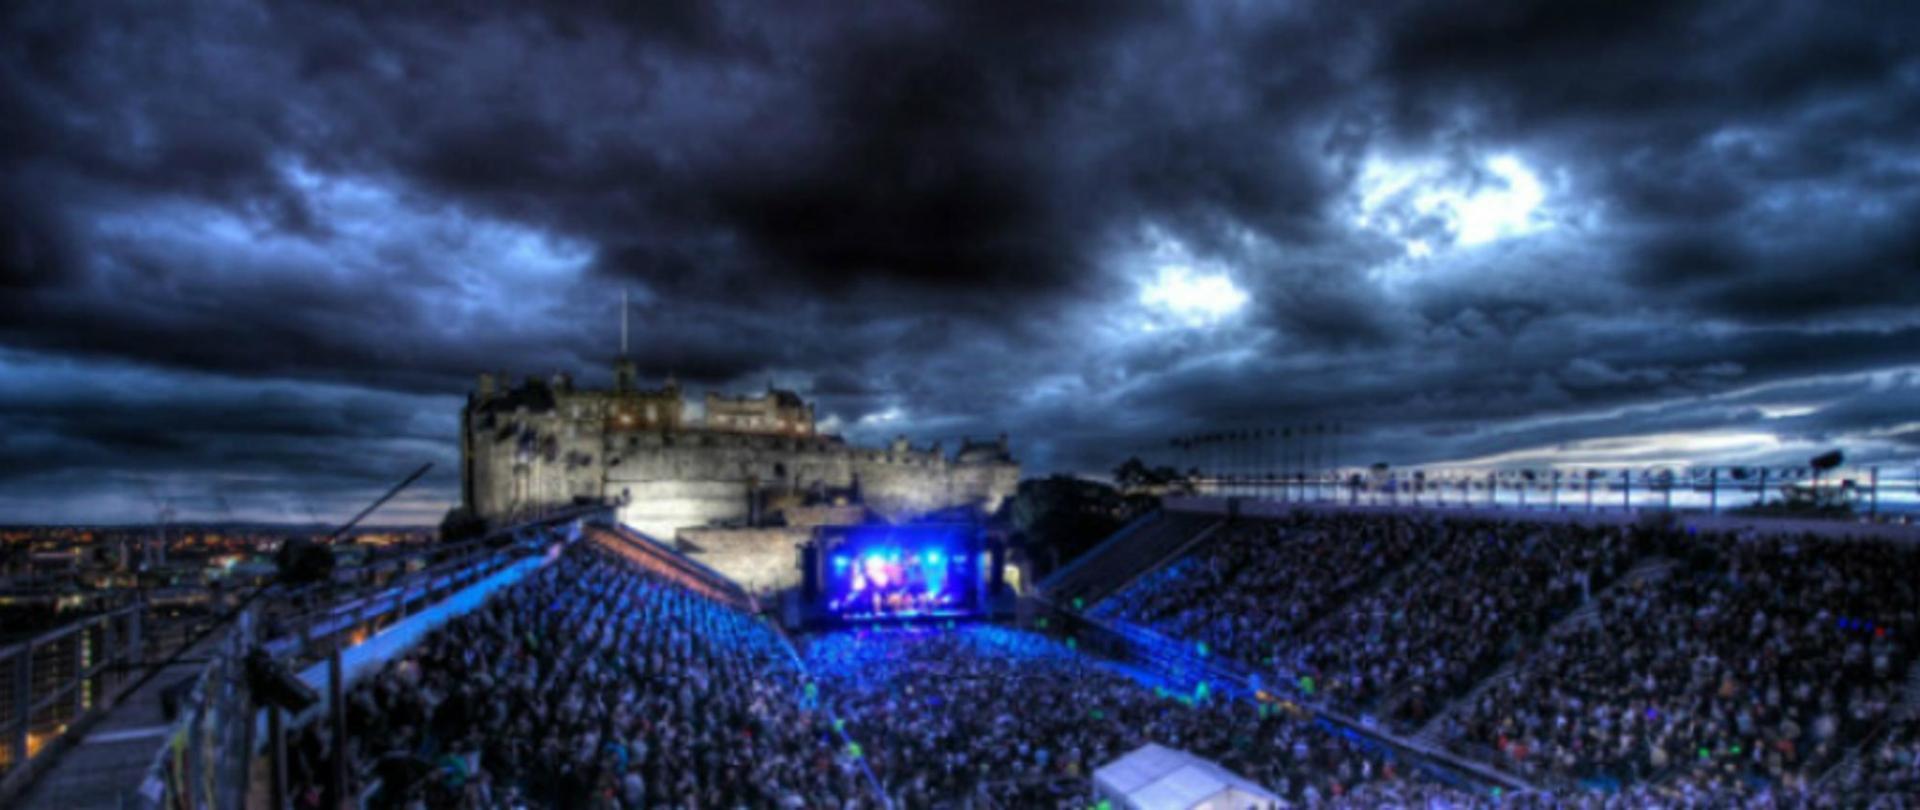 Castle-Concerts-600.jpg